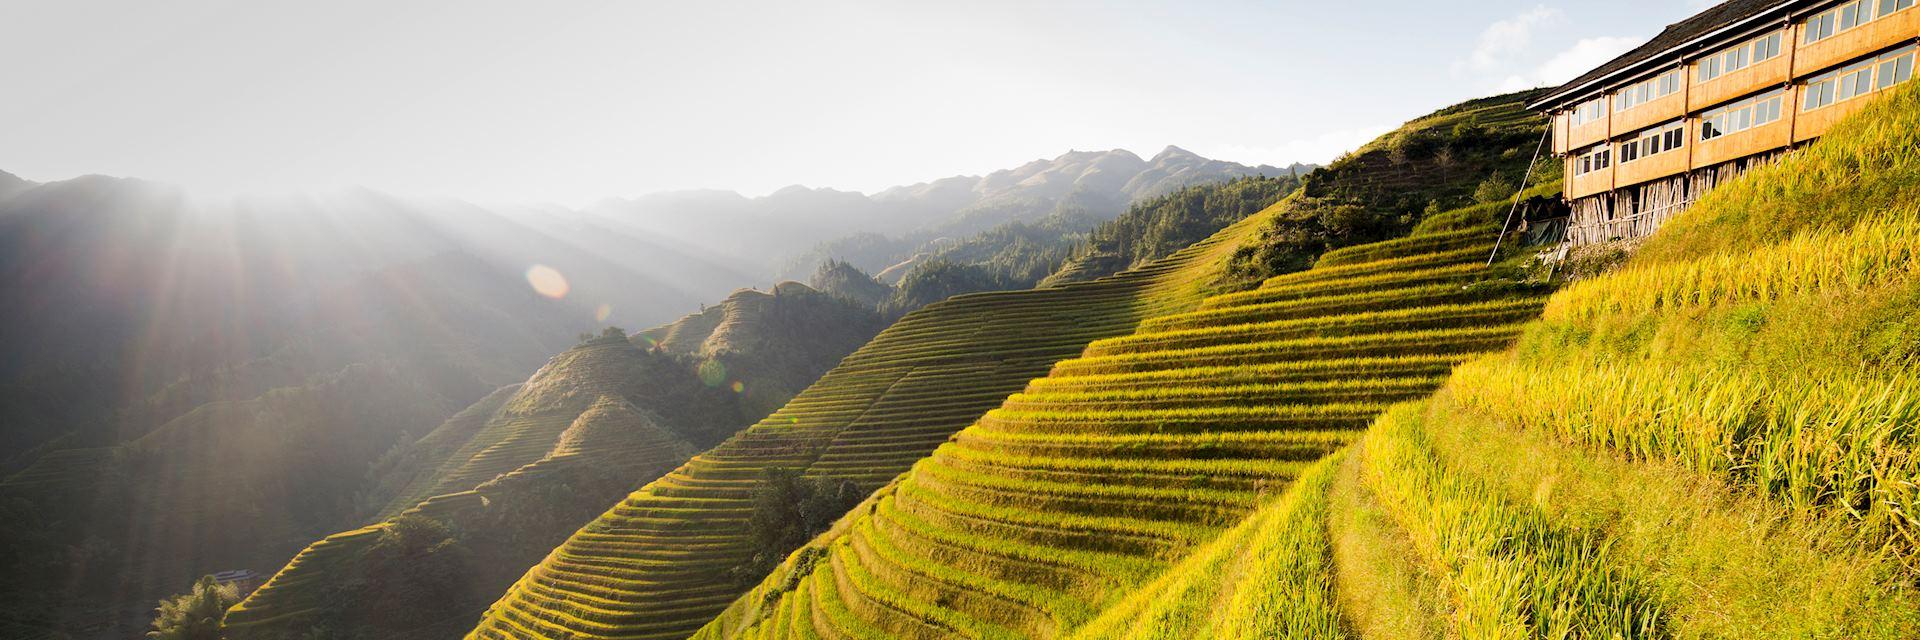 Rice terraces in Yuanyang